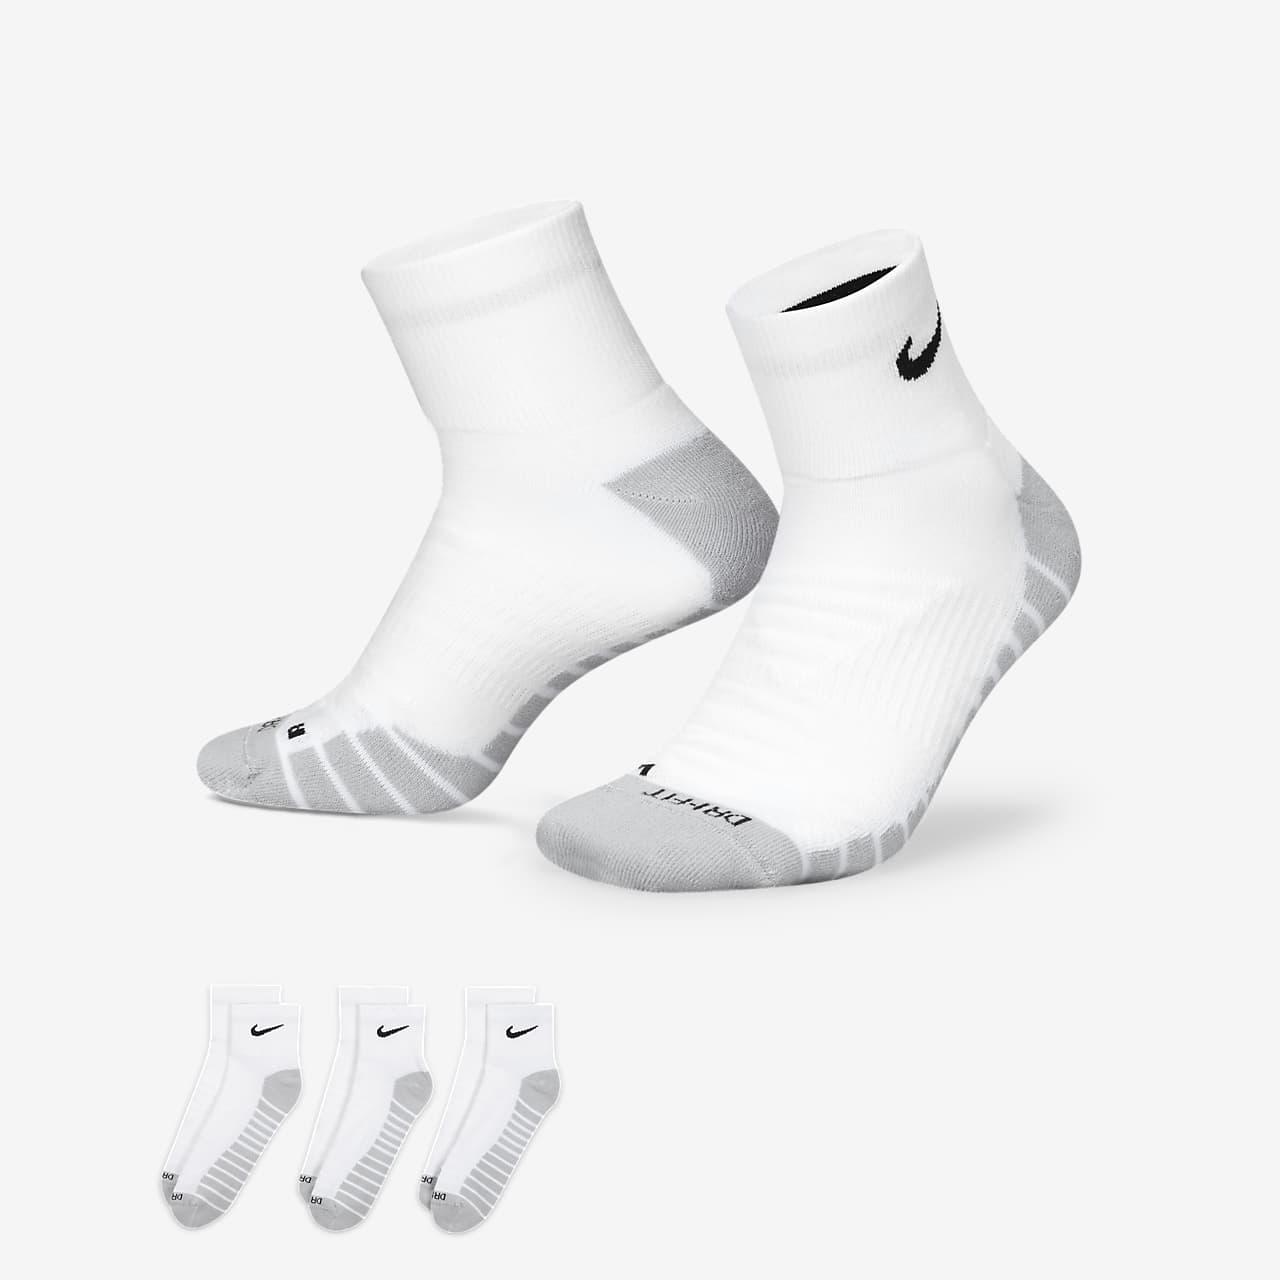 b64452652ae68 Chaussettes de training Nike Dry Cushion Quarter (3 paires). Nike.com FR